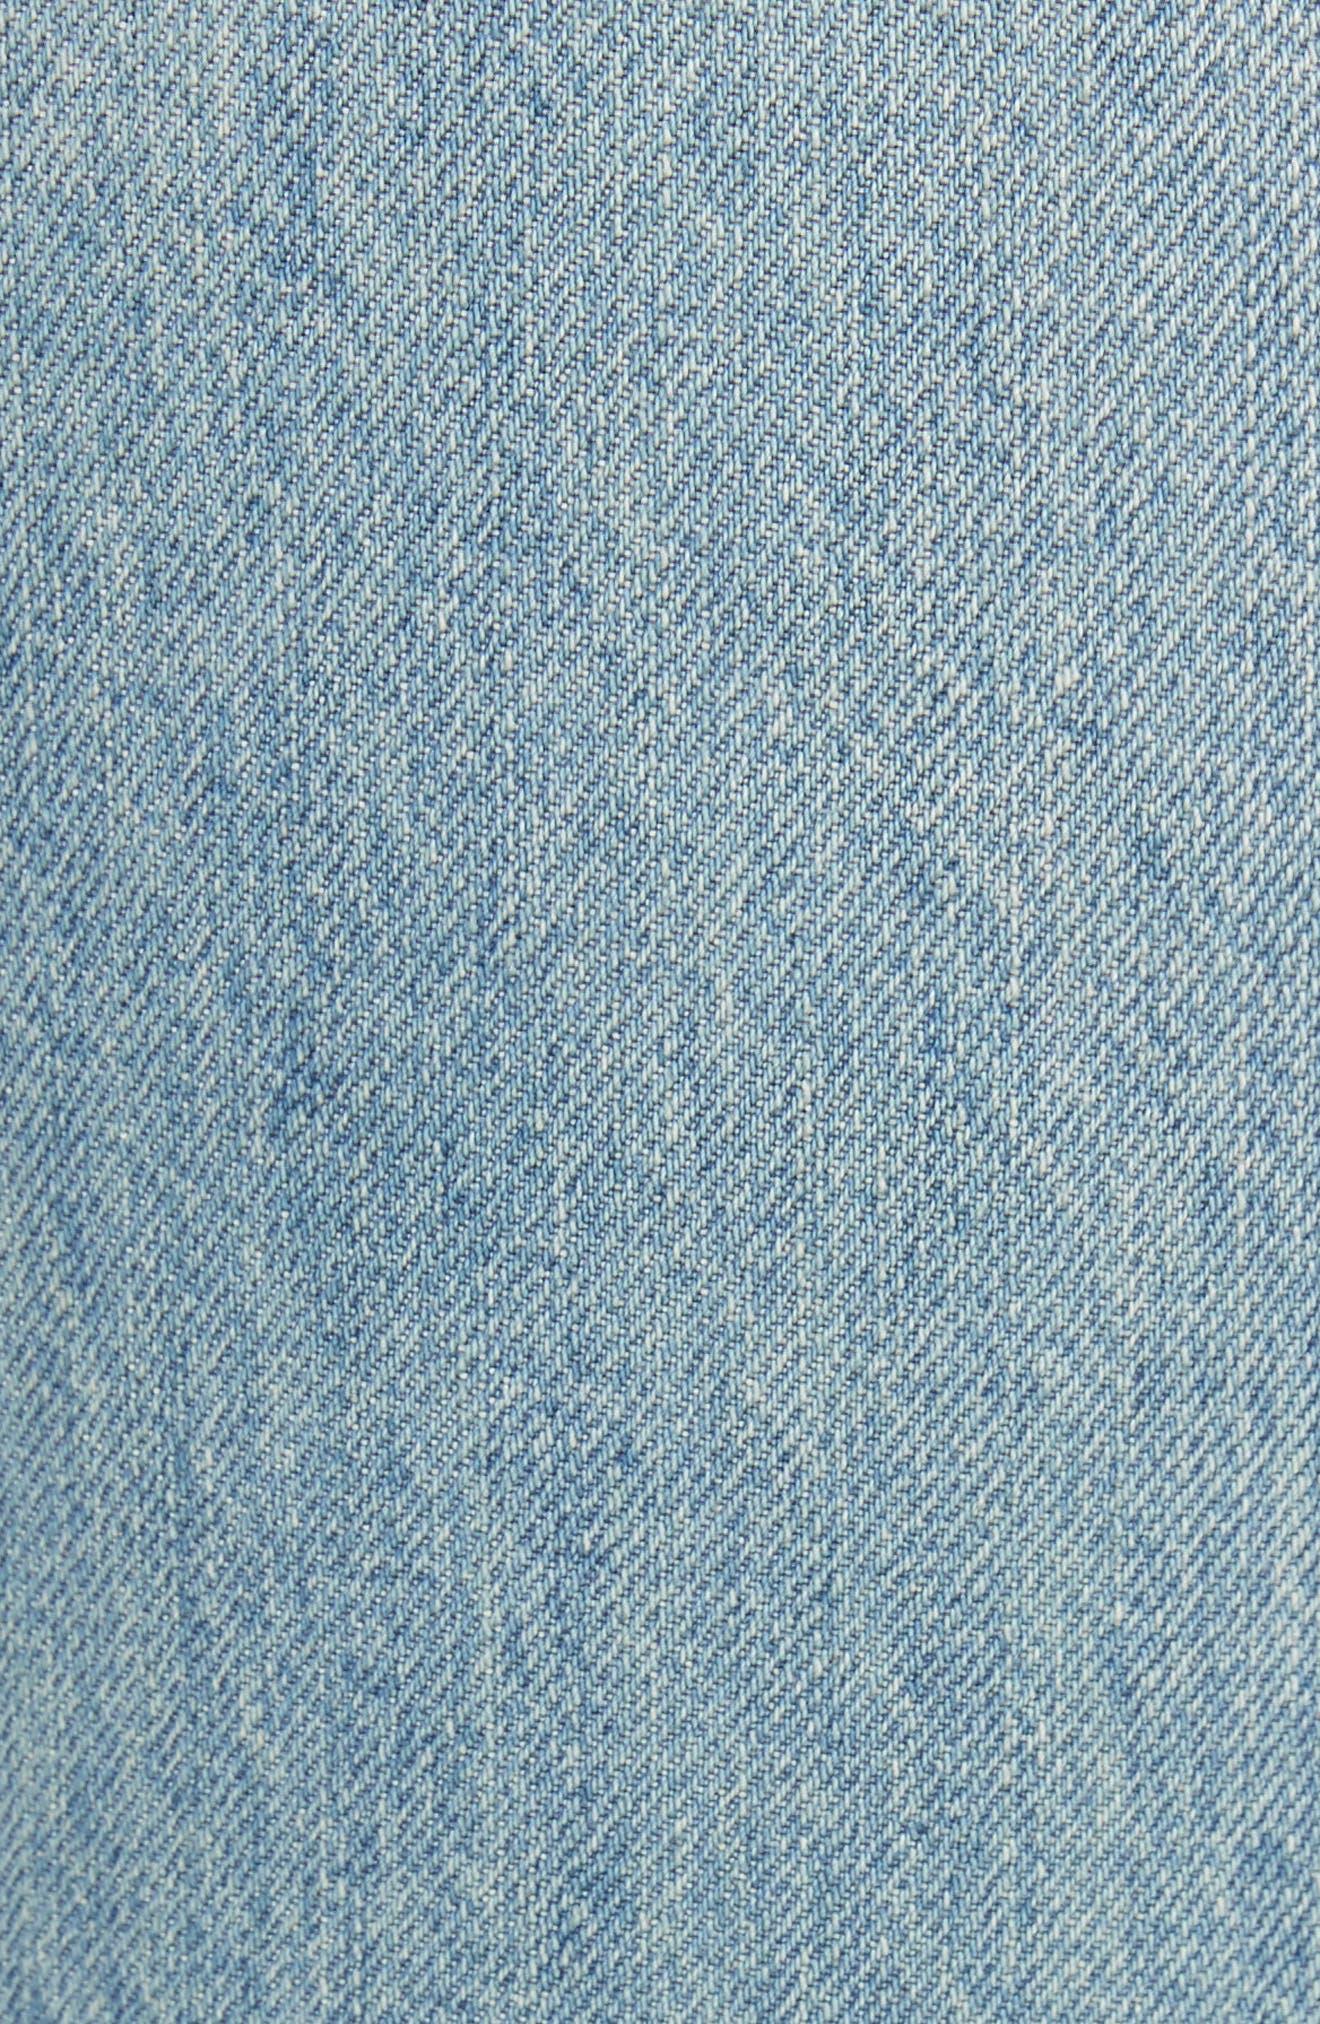 Alternate Image 5  - Re/Done Originals High Waist Ankle Zip Jeans